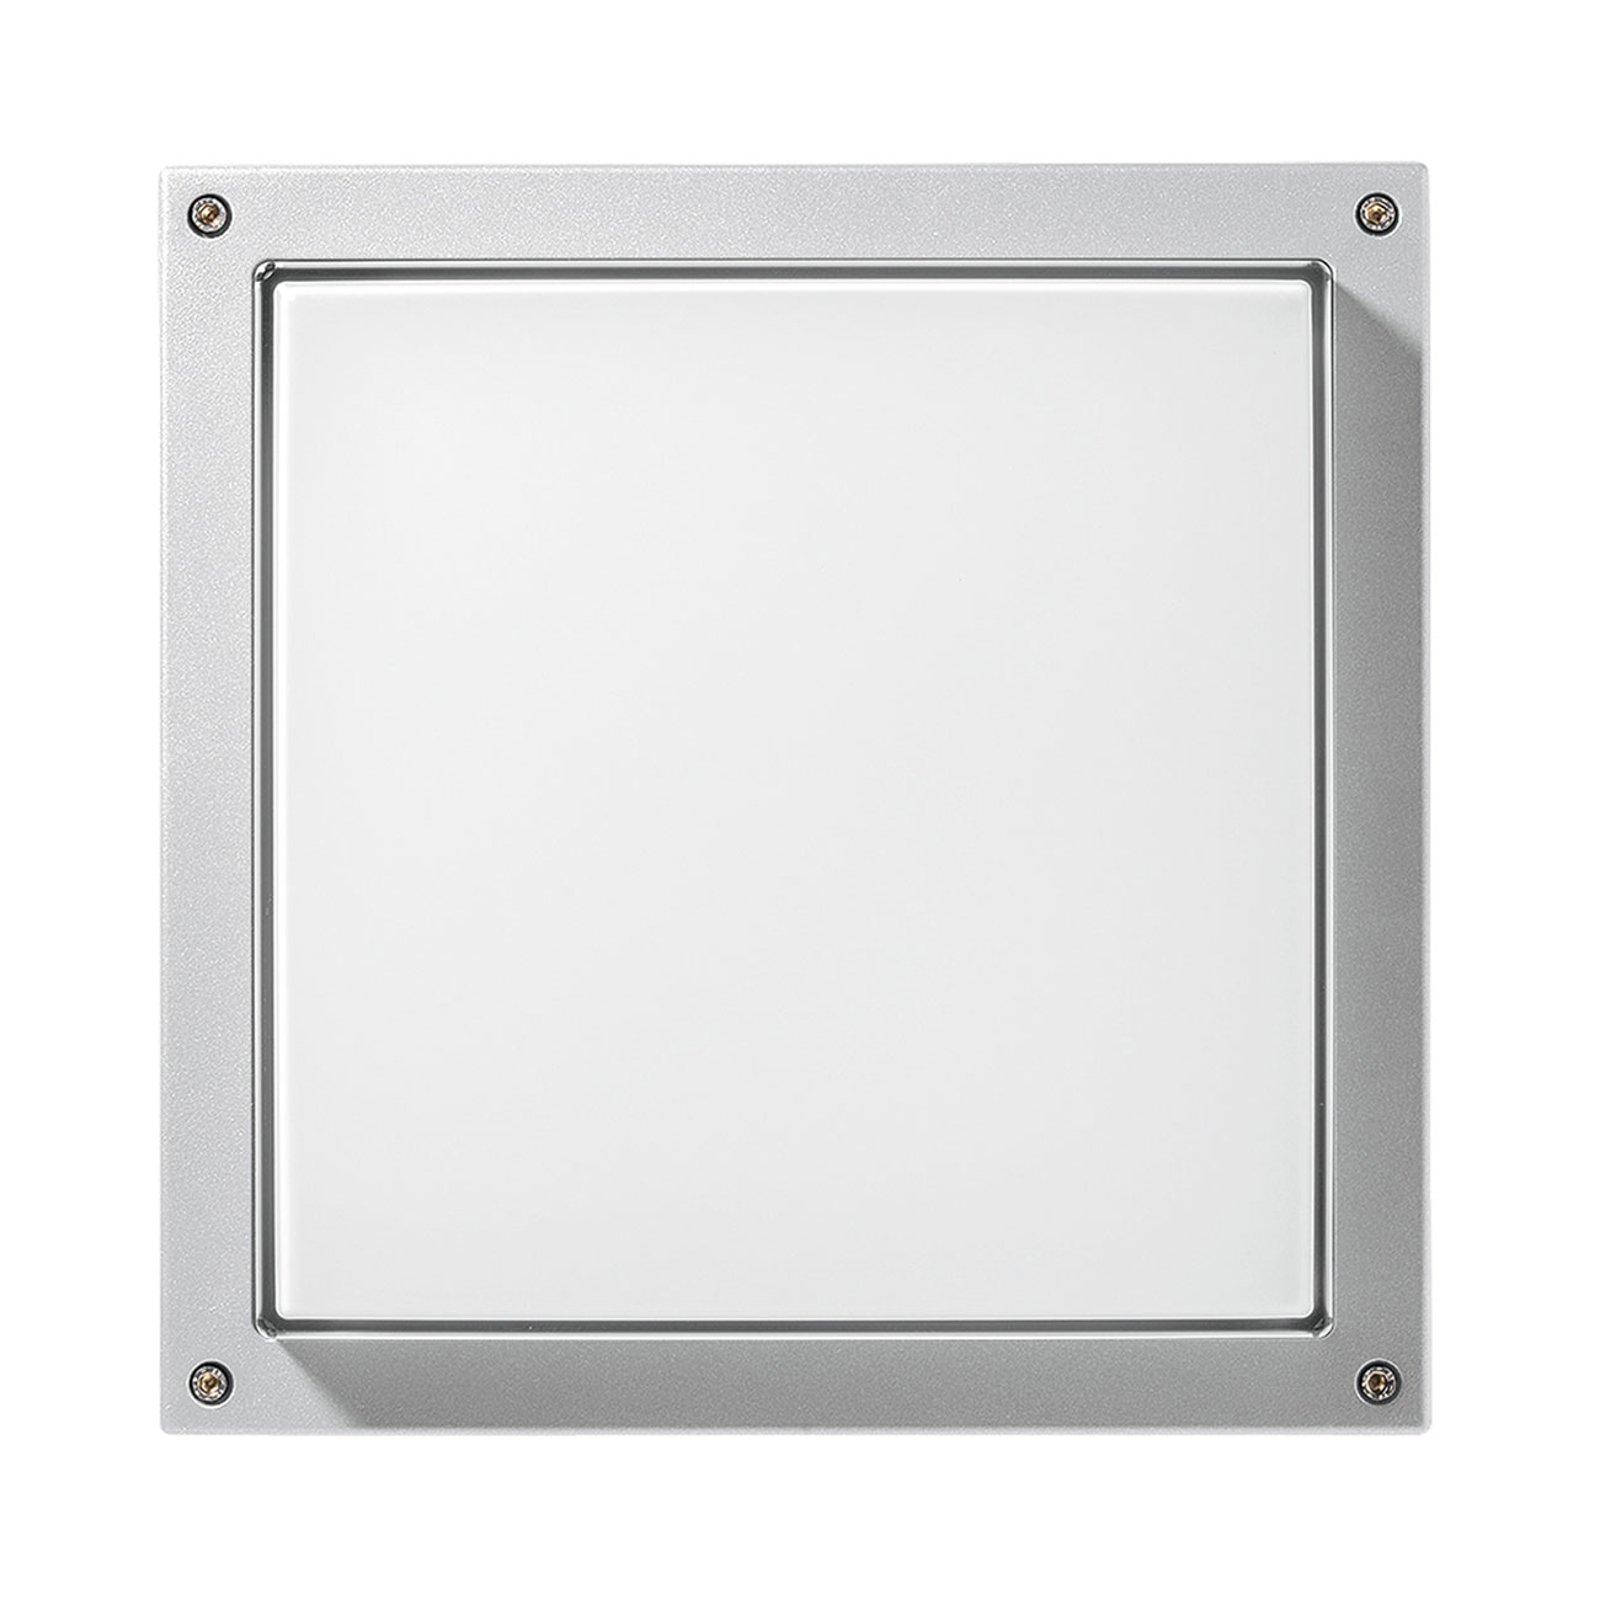 Vegglampe Bliz Square 40 3 000 K, hvit dimbar